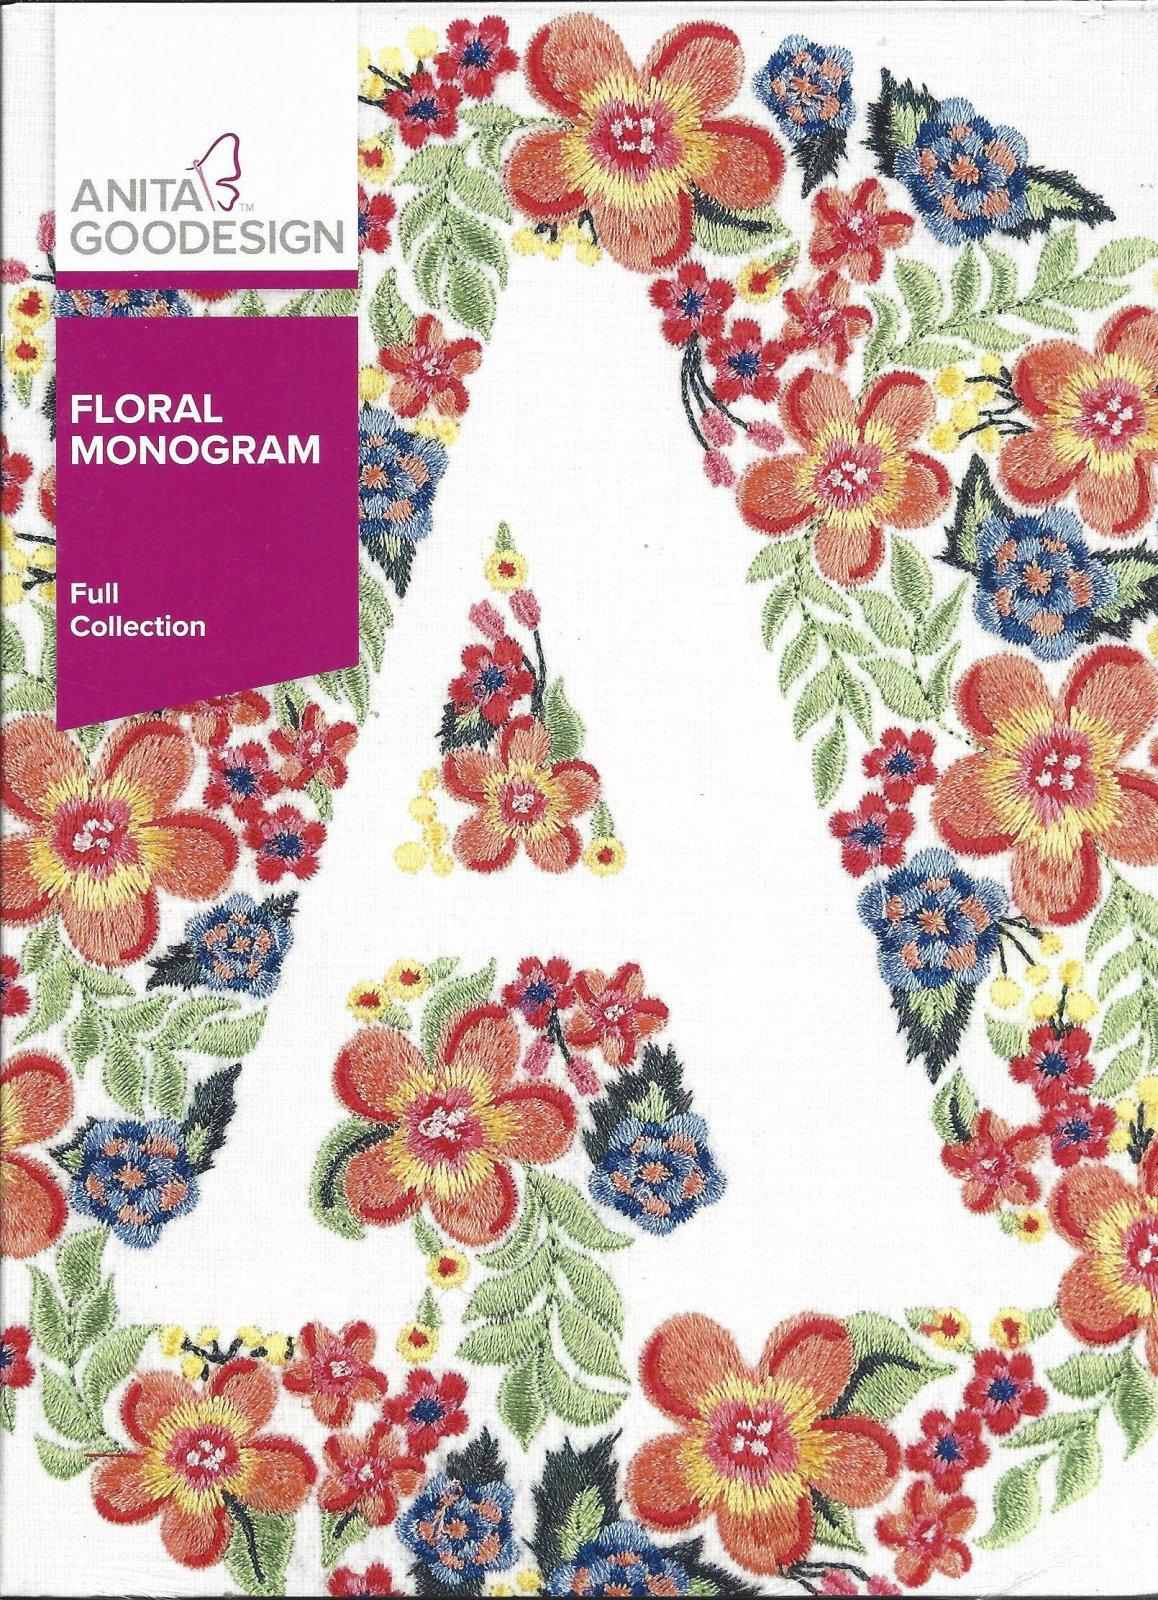 AG FLORAL MONOGRAM 367AGHD